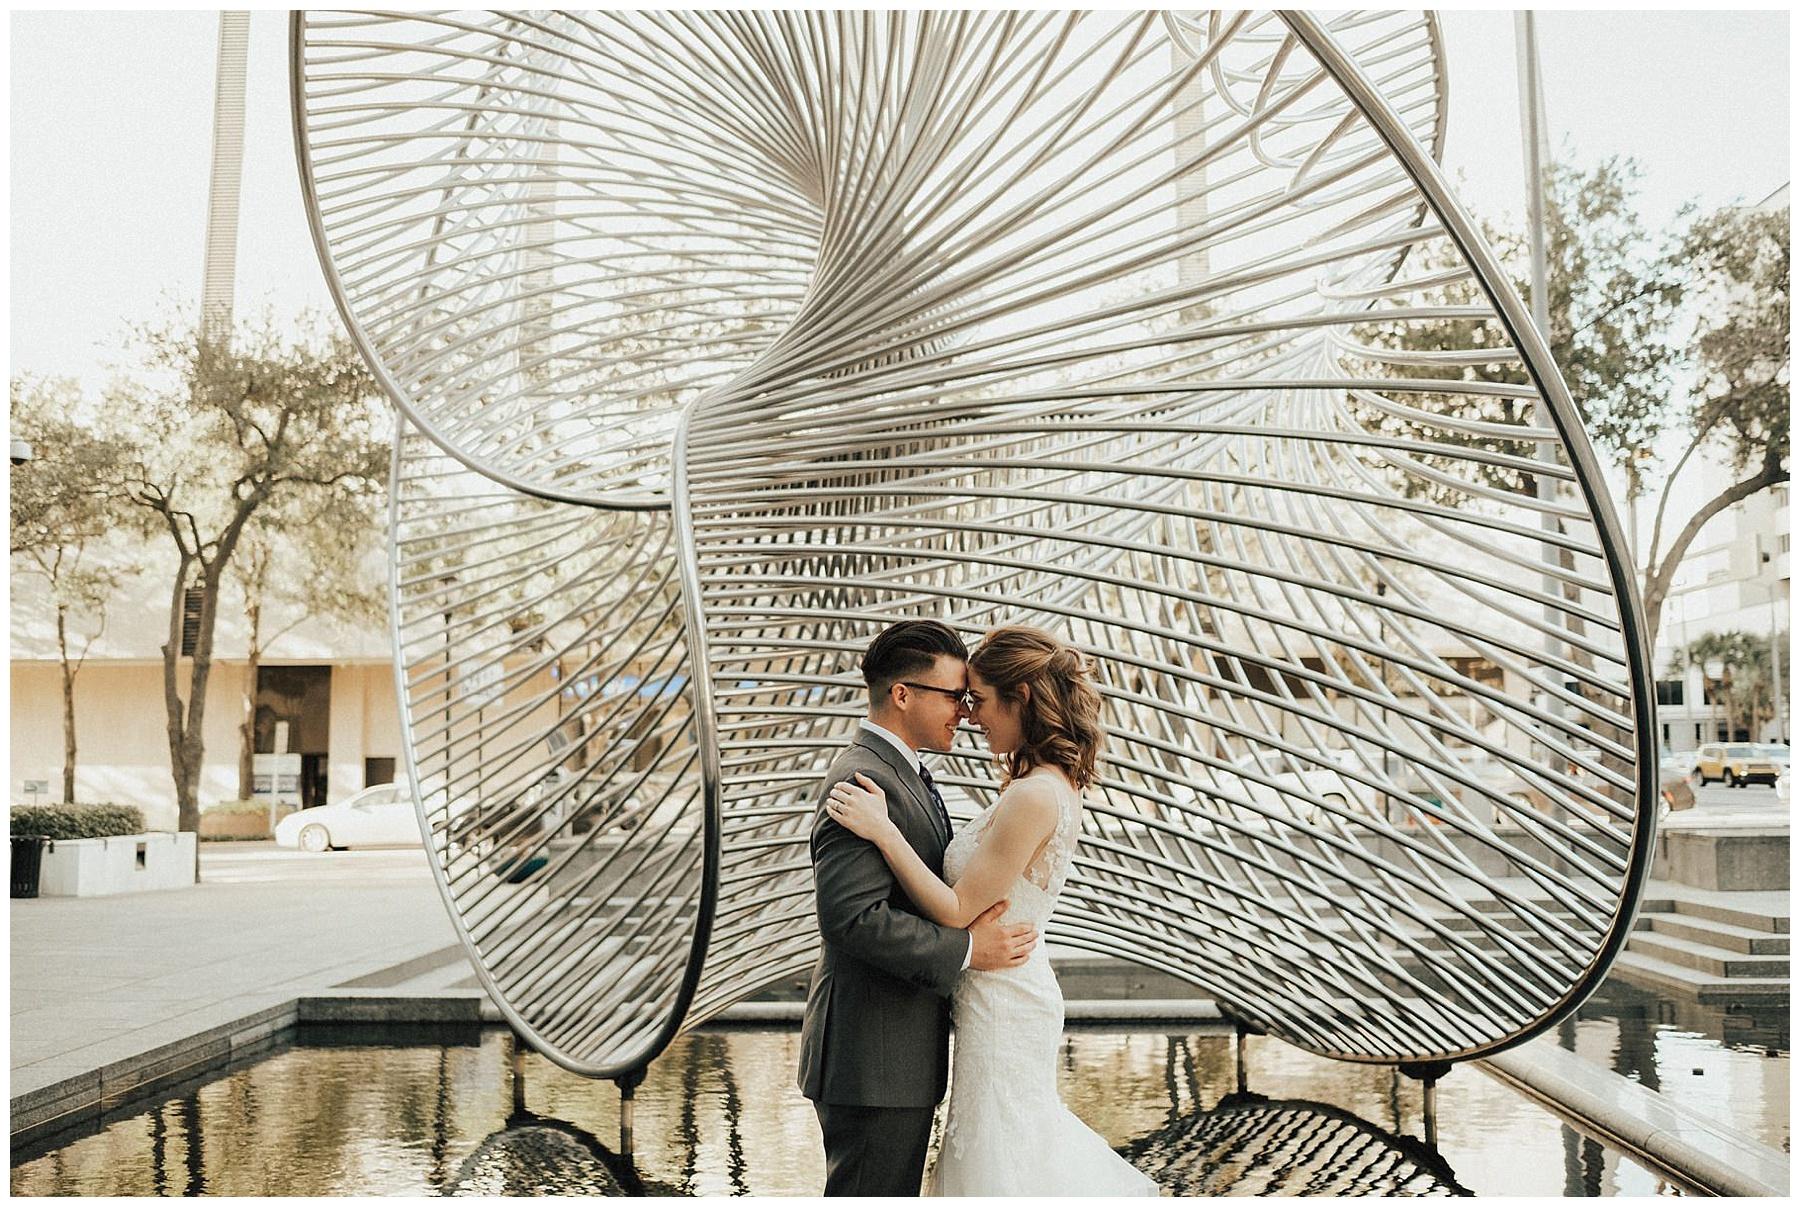 Kylie Garden Wedding Tampa Wedding Photographer-49.jpg